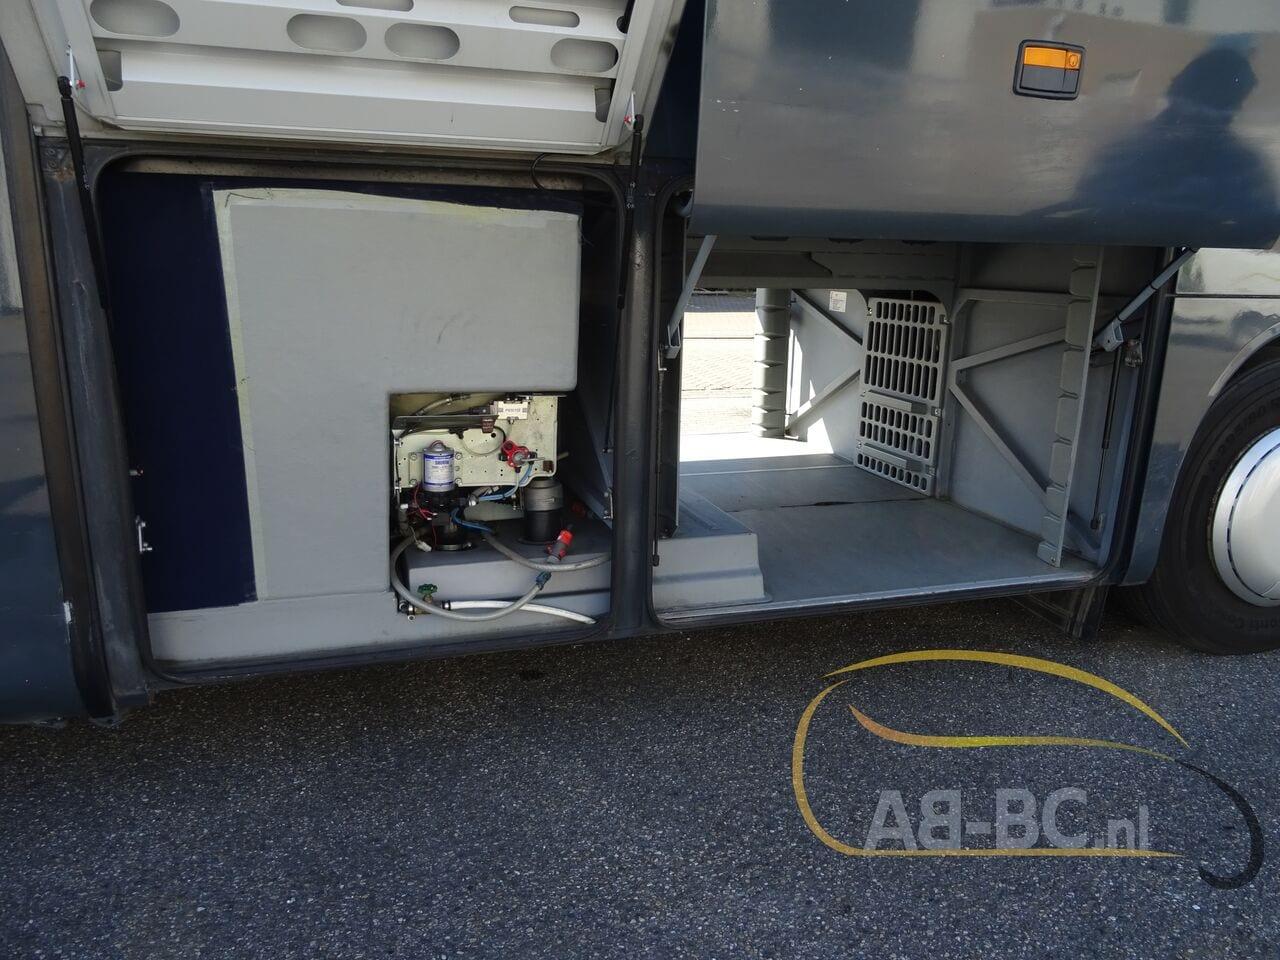 coach-busSETRA-S415-GT-HD-FINAL-EDITION-51-SEATS-LIFTBUS---1620381699086954373_big_23385f523cabae0adee26a6be2ceae9f--21050713010665719300